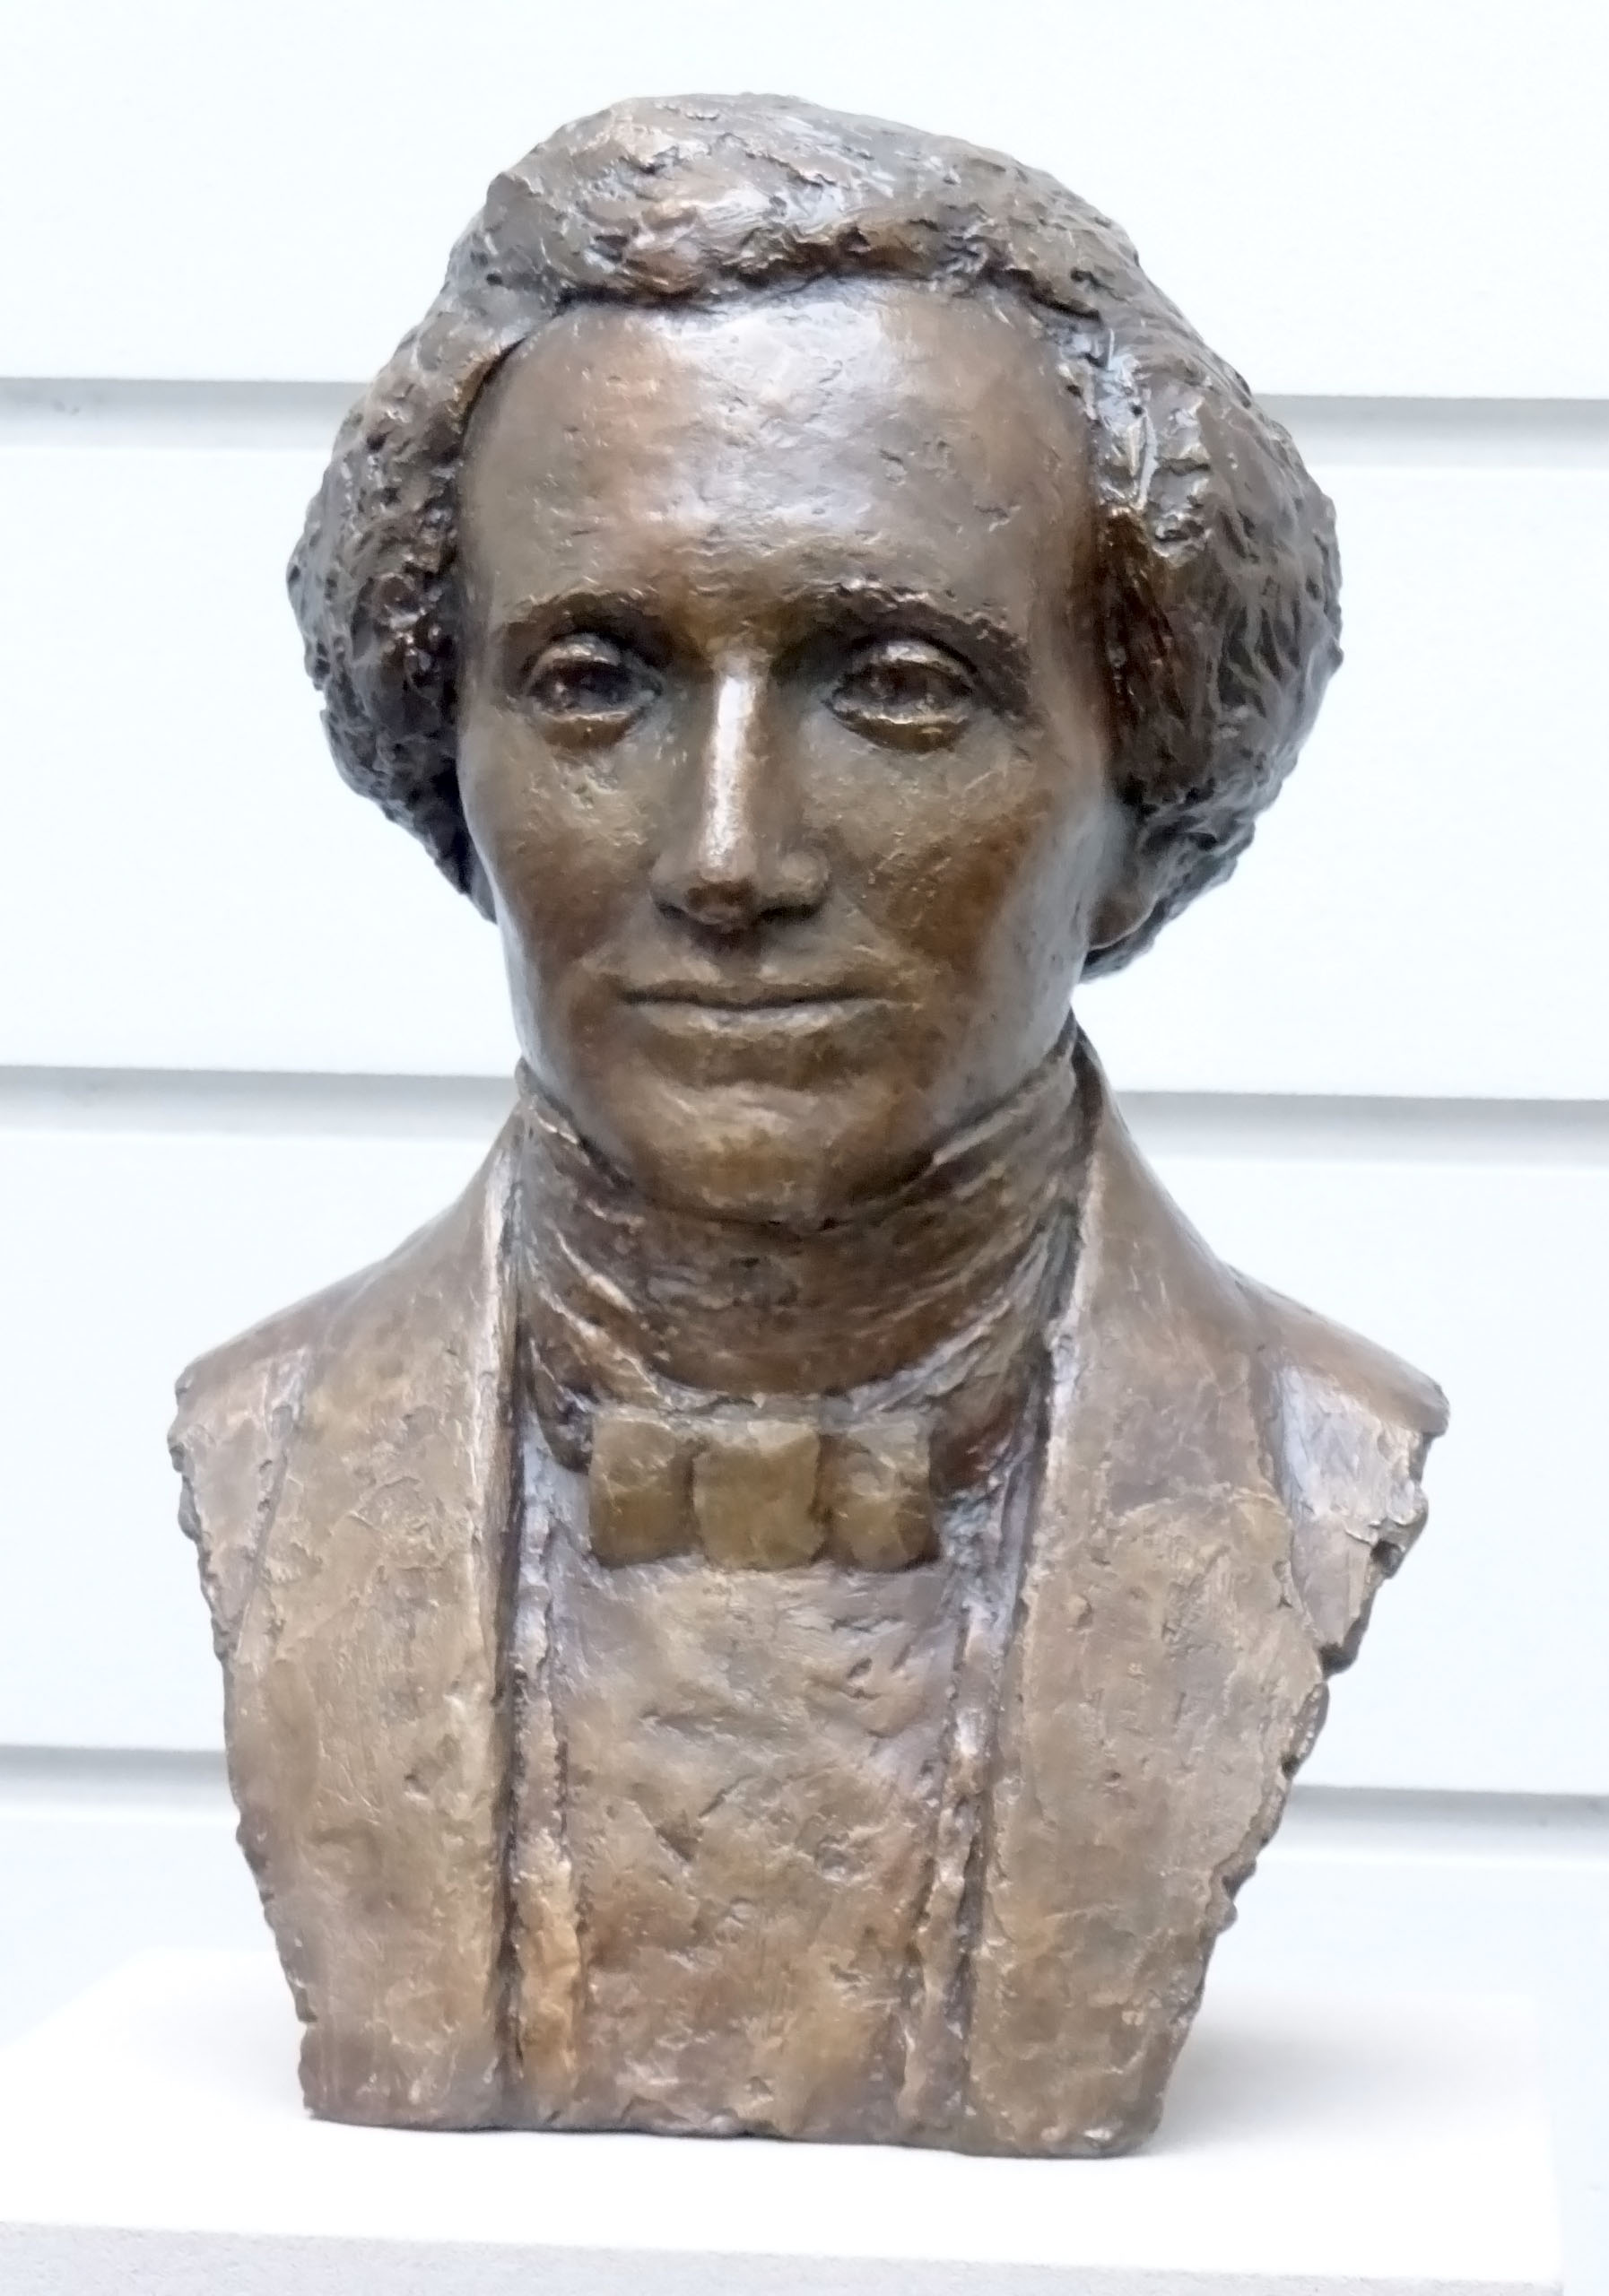 Felix.Mendelssohn.Bartholdy.Bueste.von.Lore.Plietzsch.2015.jpg